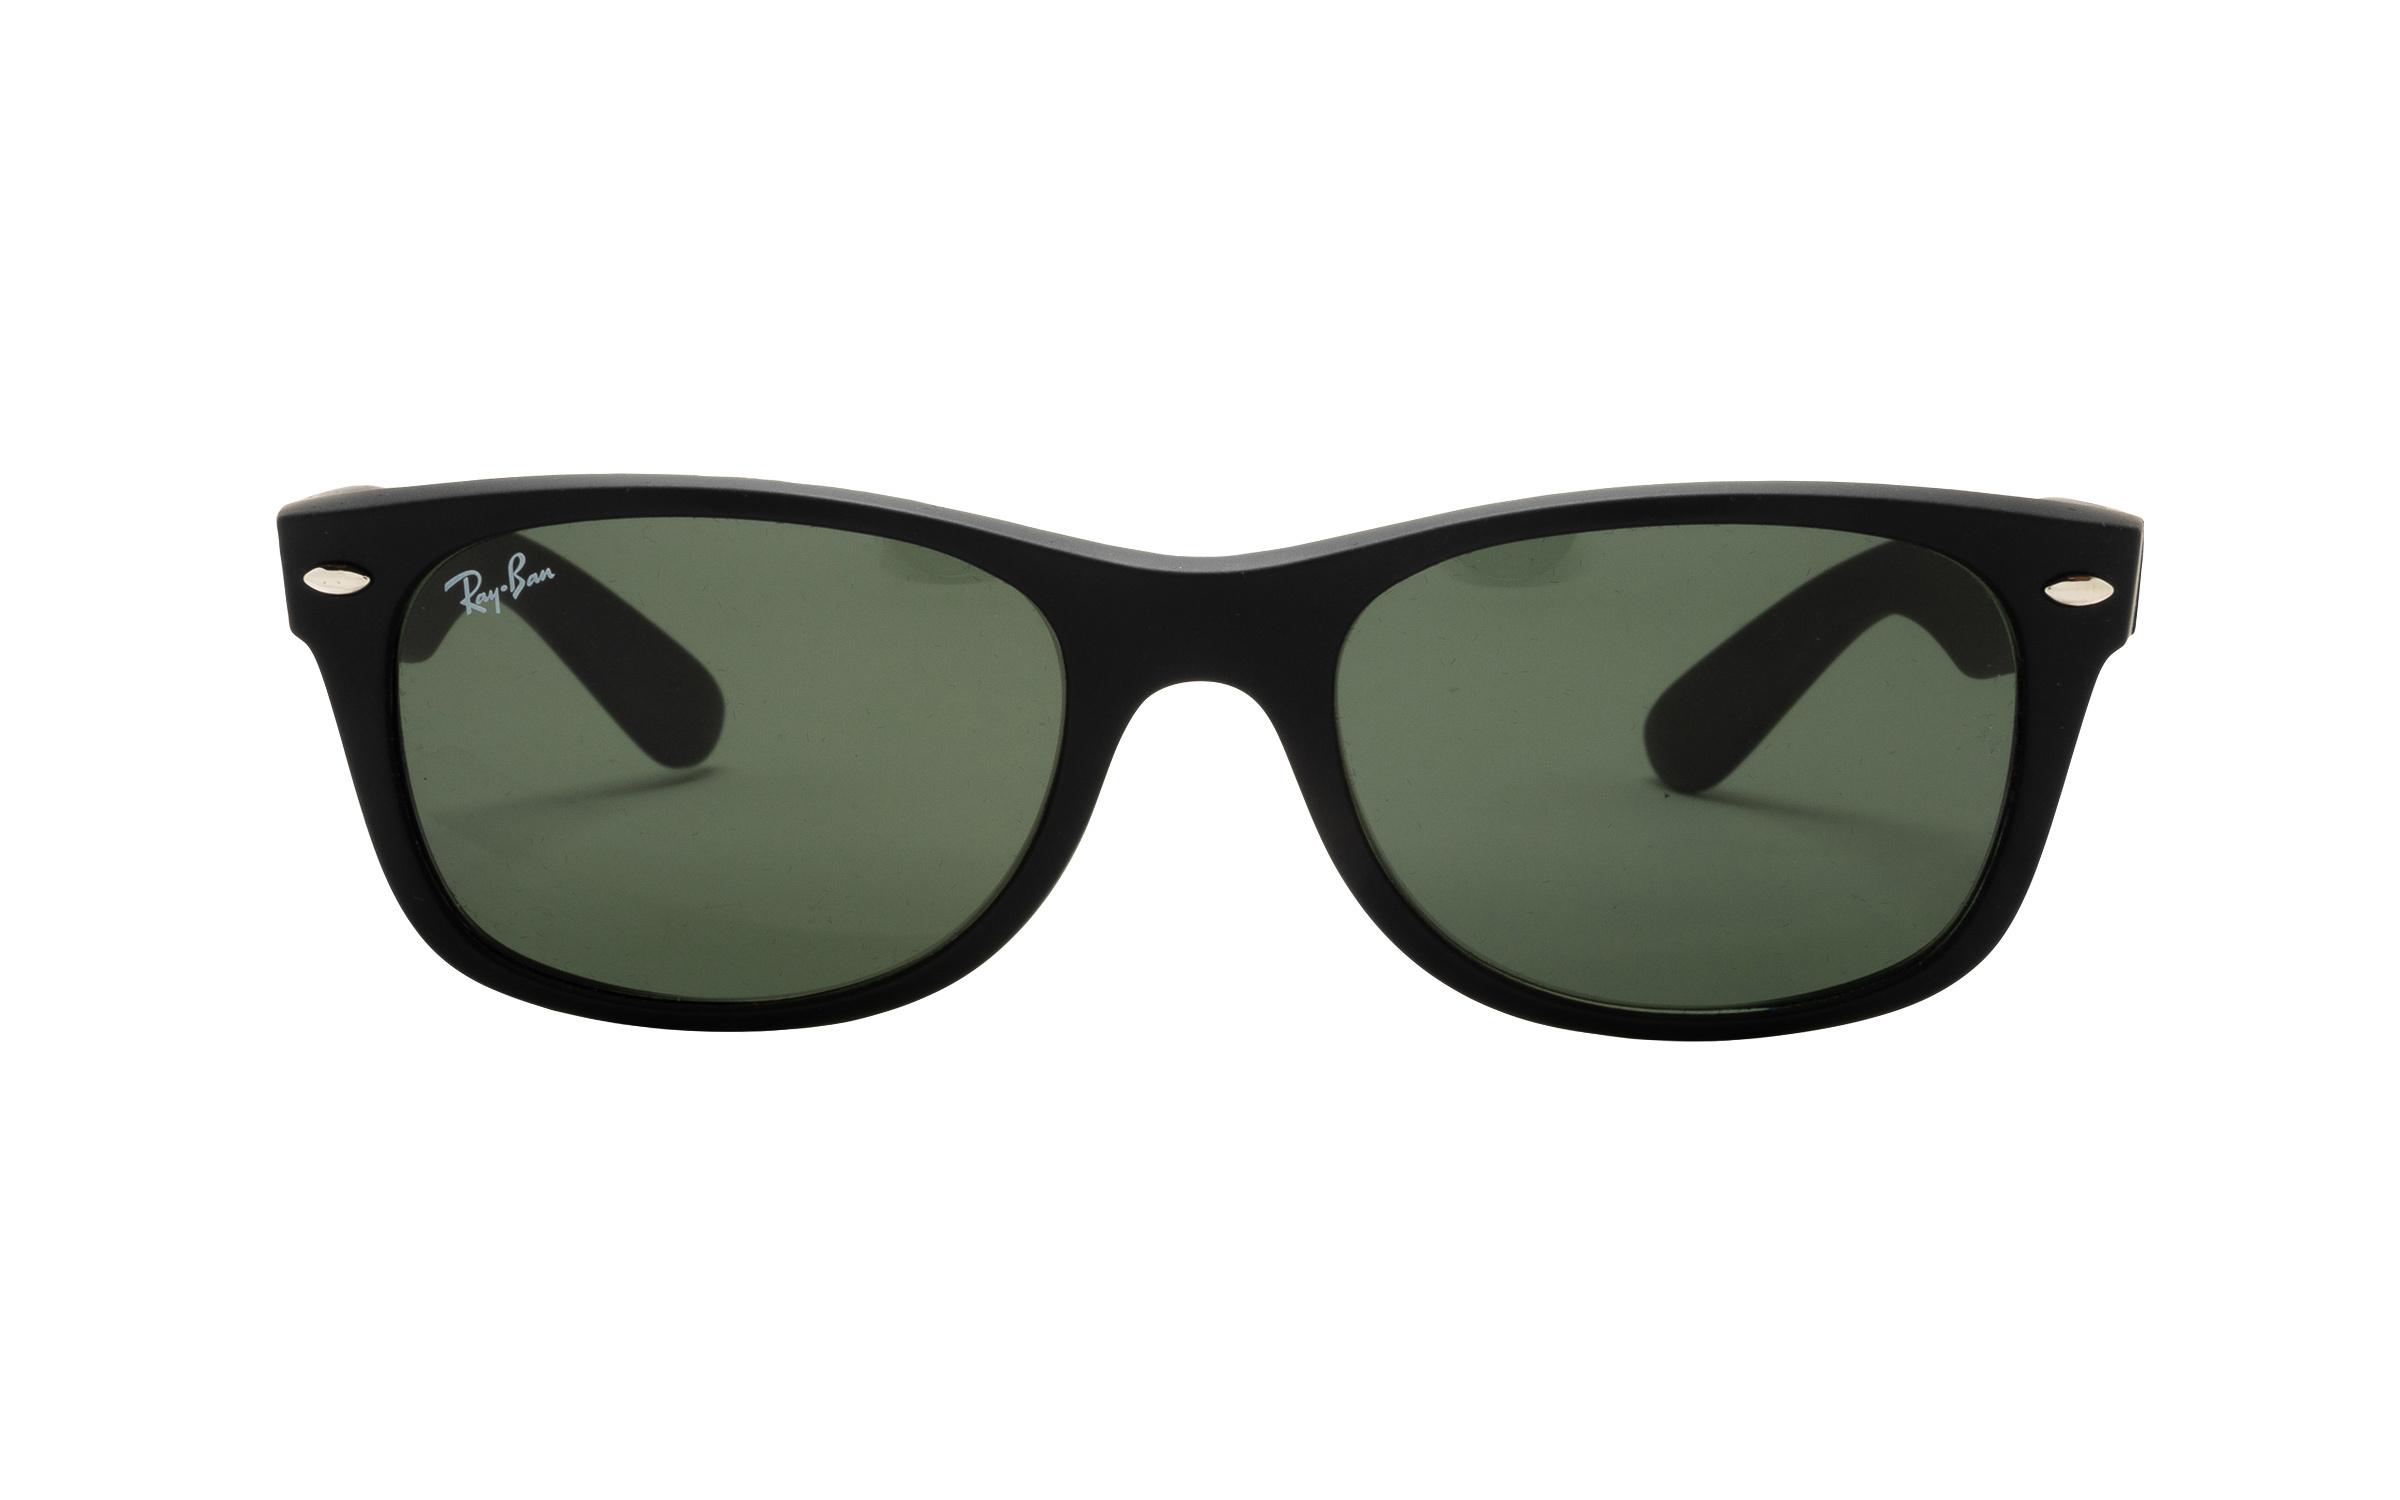 coastal.com - RayBan Ray-Ban RB2132 622 Rubber 52 Sunglasses in Black – Online Coastal 144.00 USD